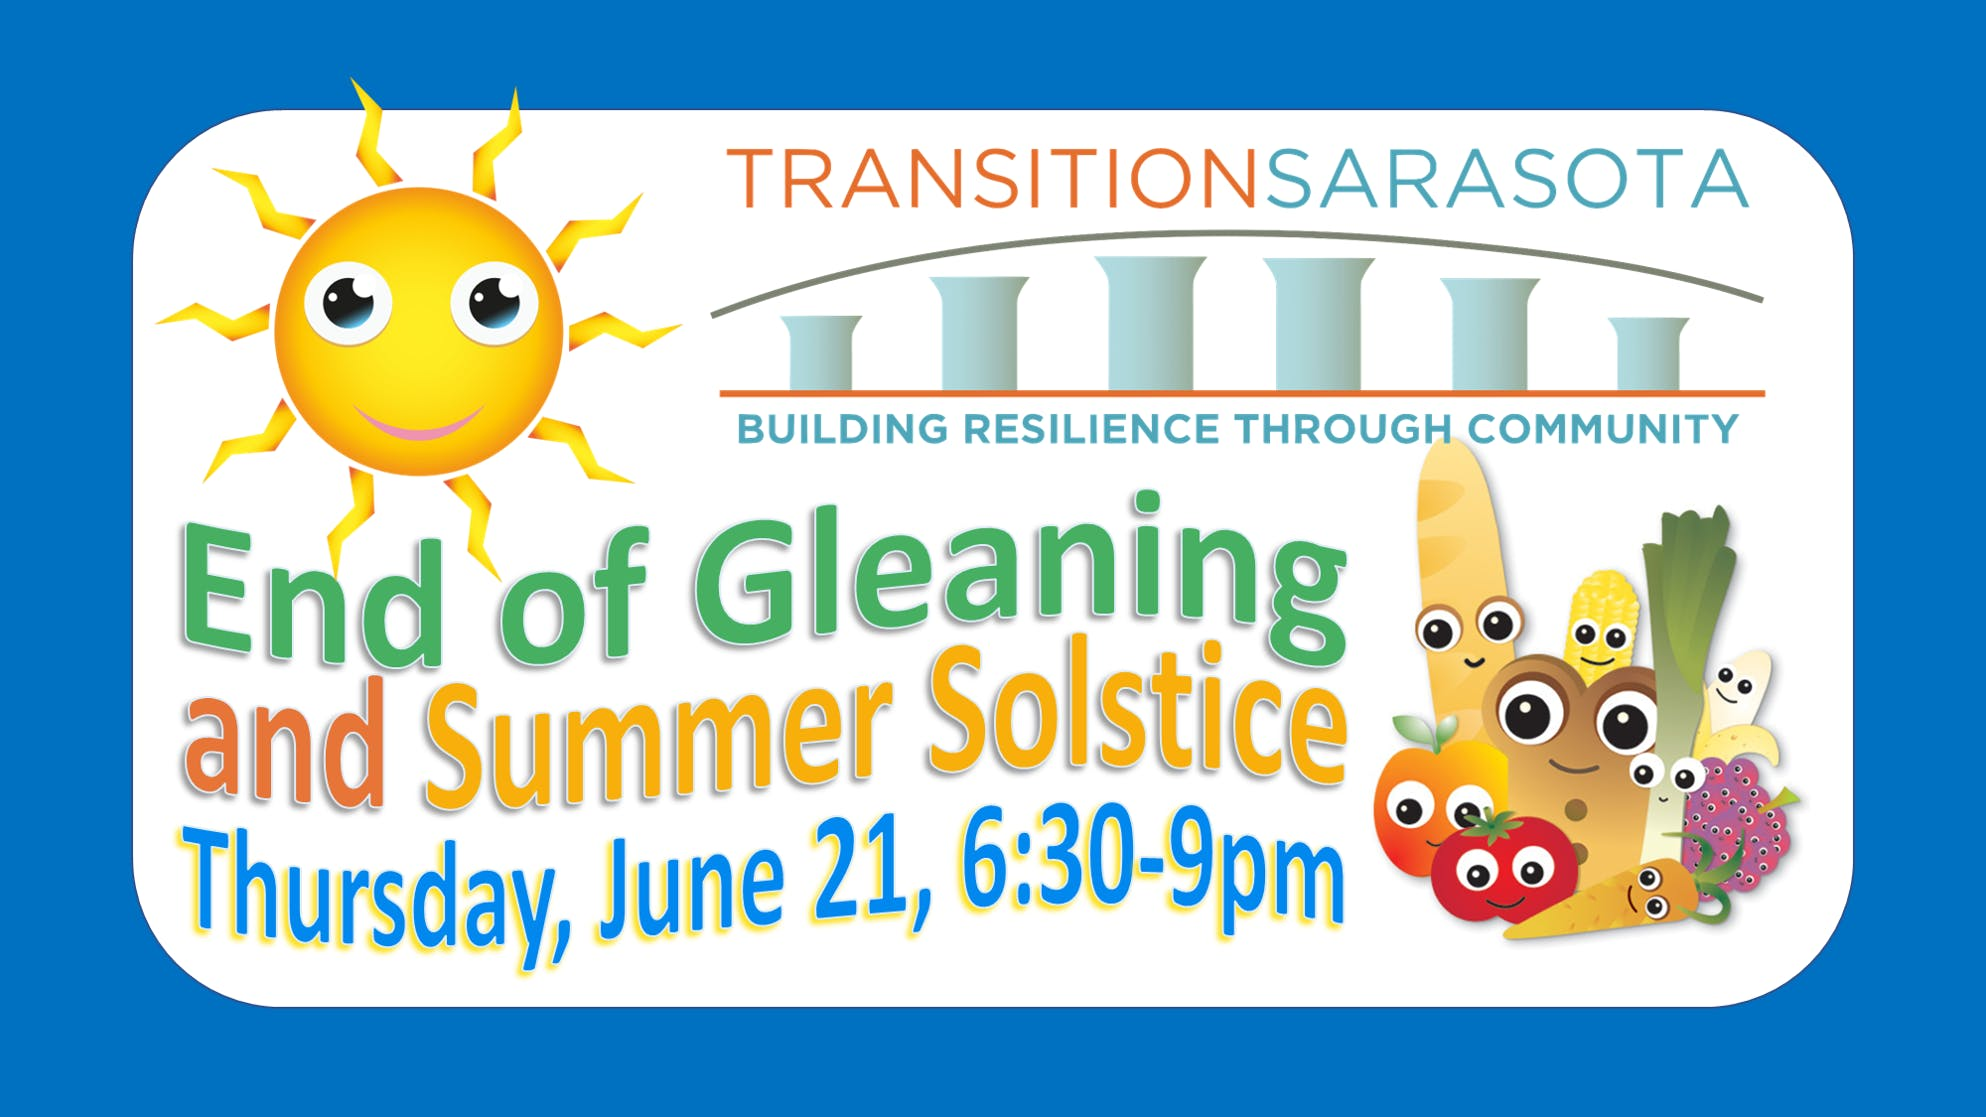 Transition Sarasota - Celebrate Gleaning and